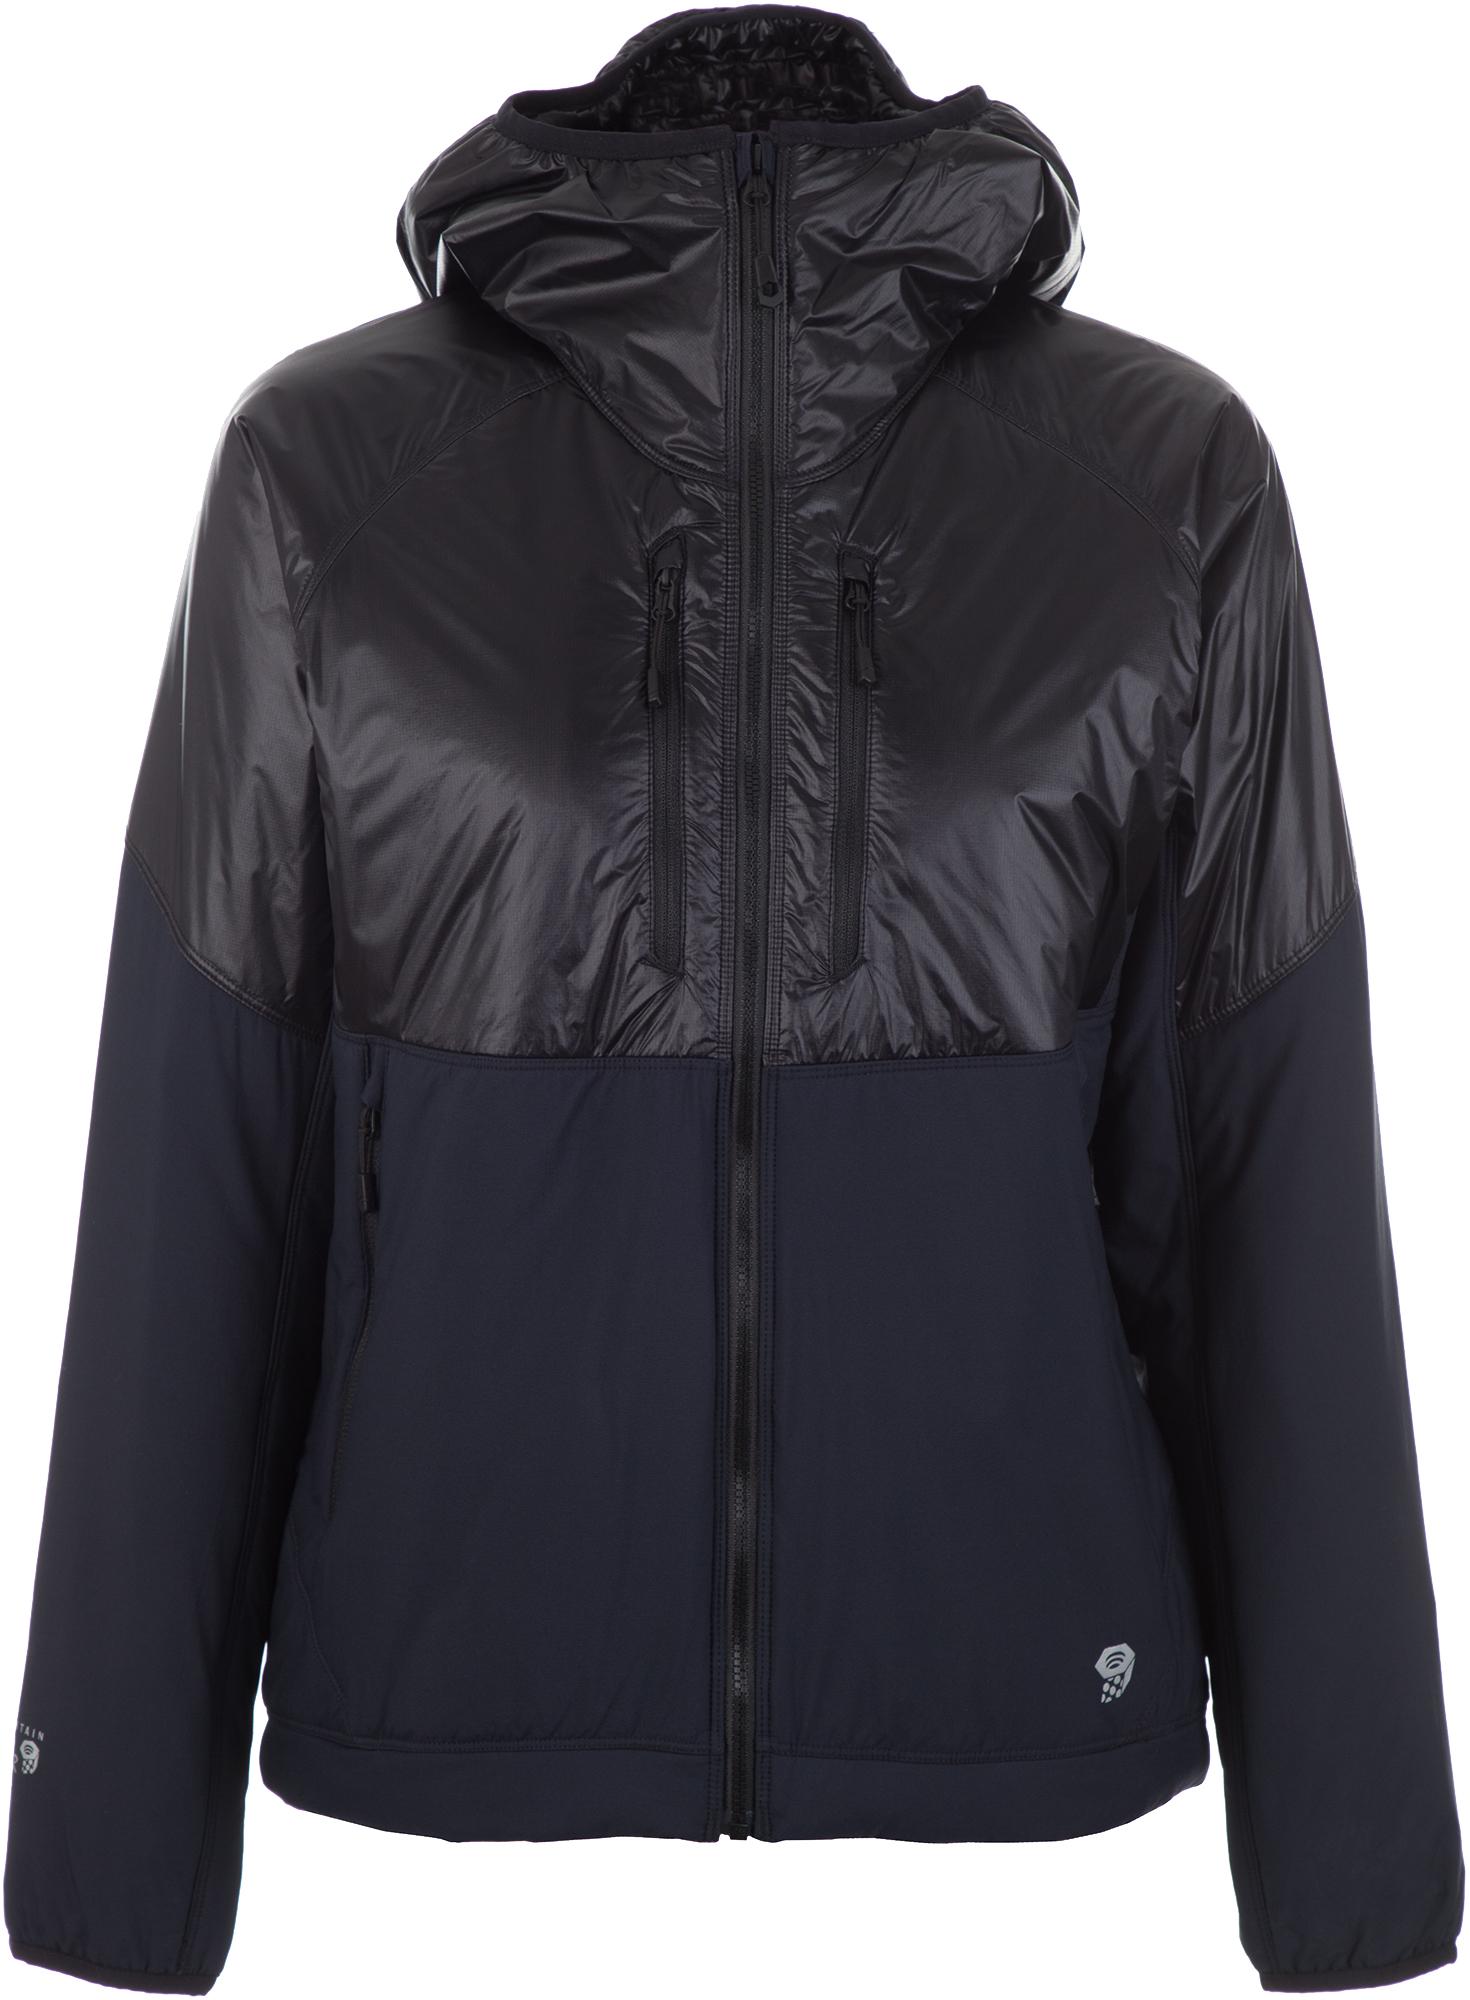 Mountain Hardwear Куртка утепленная женская Mountain Hardwear Kor Strata, размер 50 цена